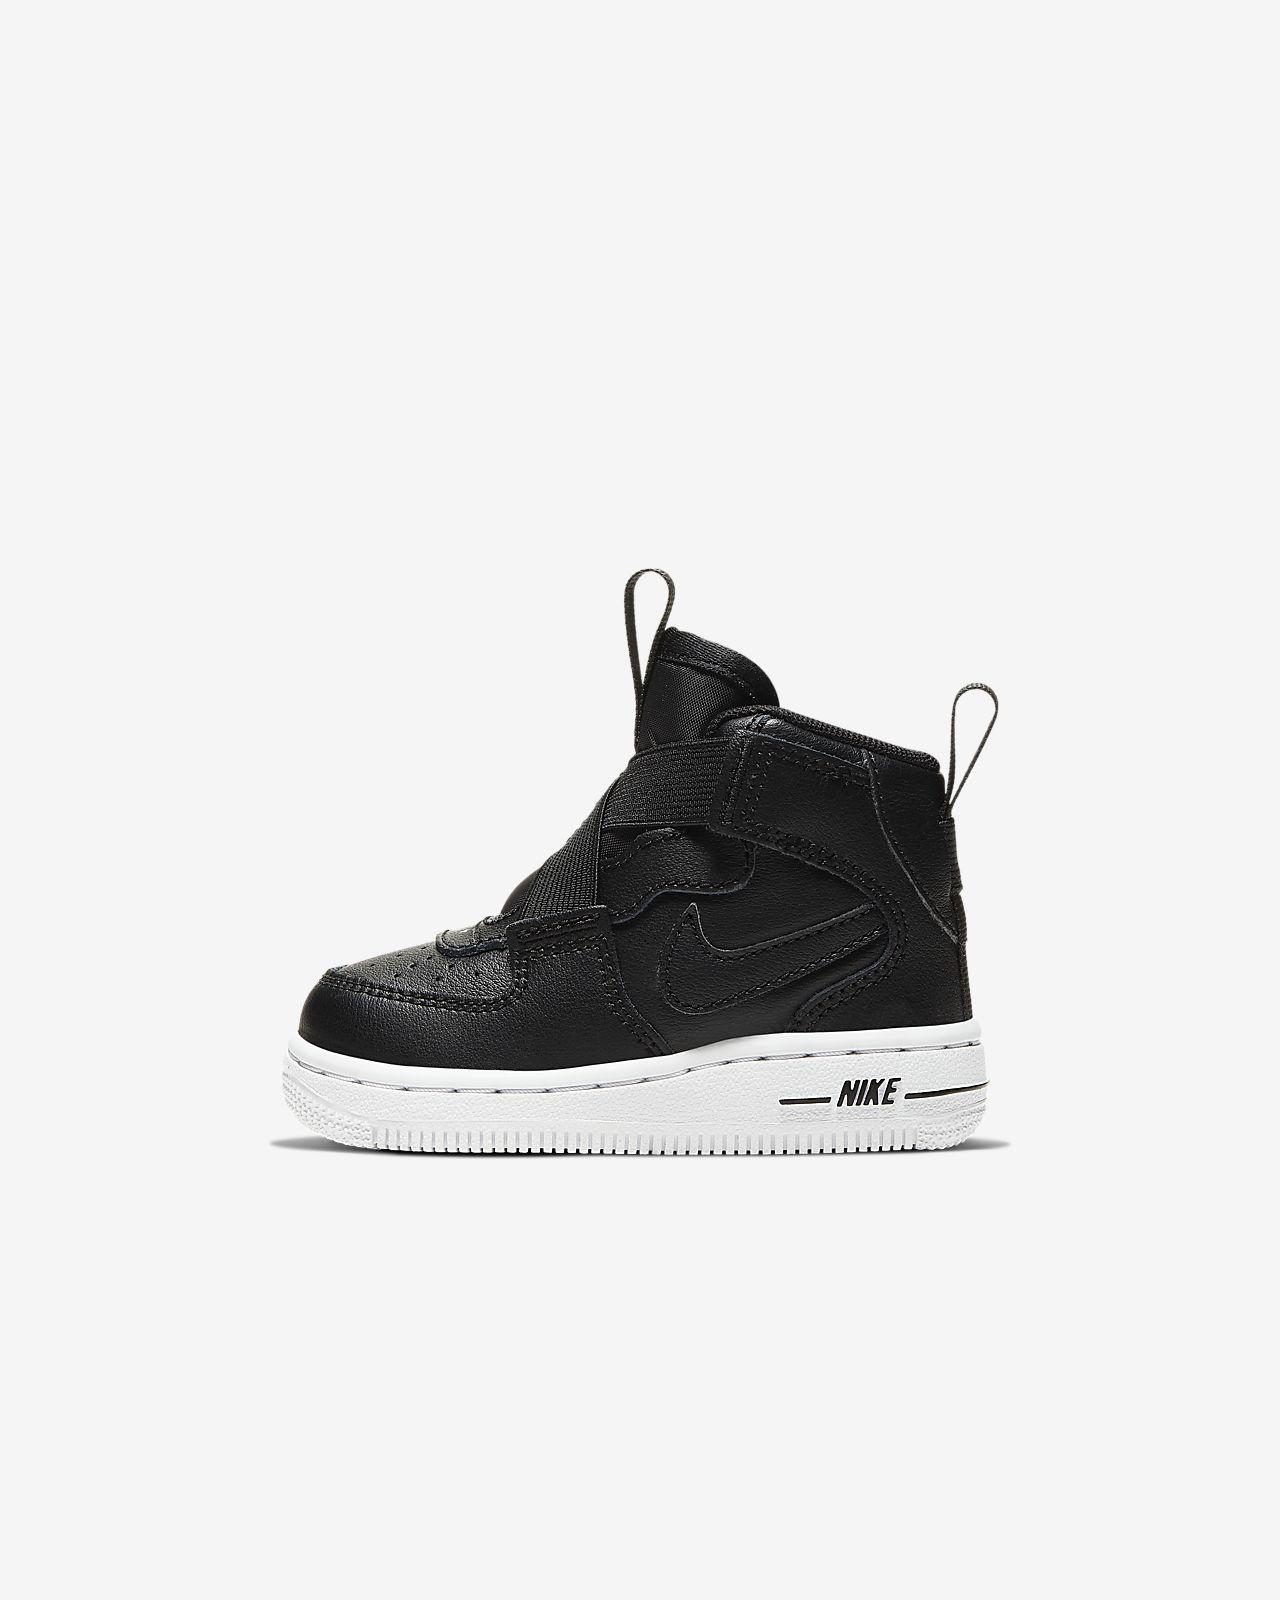 Nike Force 1 Highness Baby/Toddler Shoe